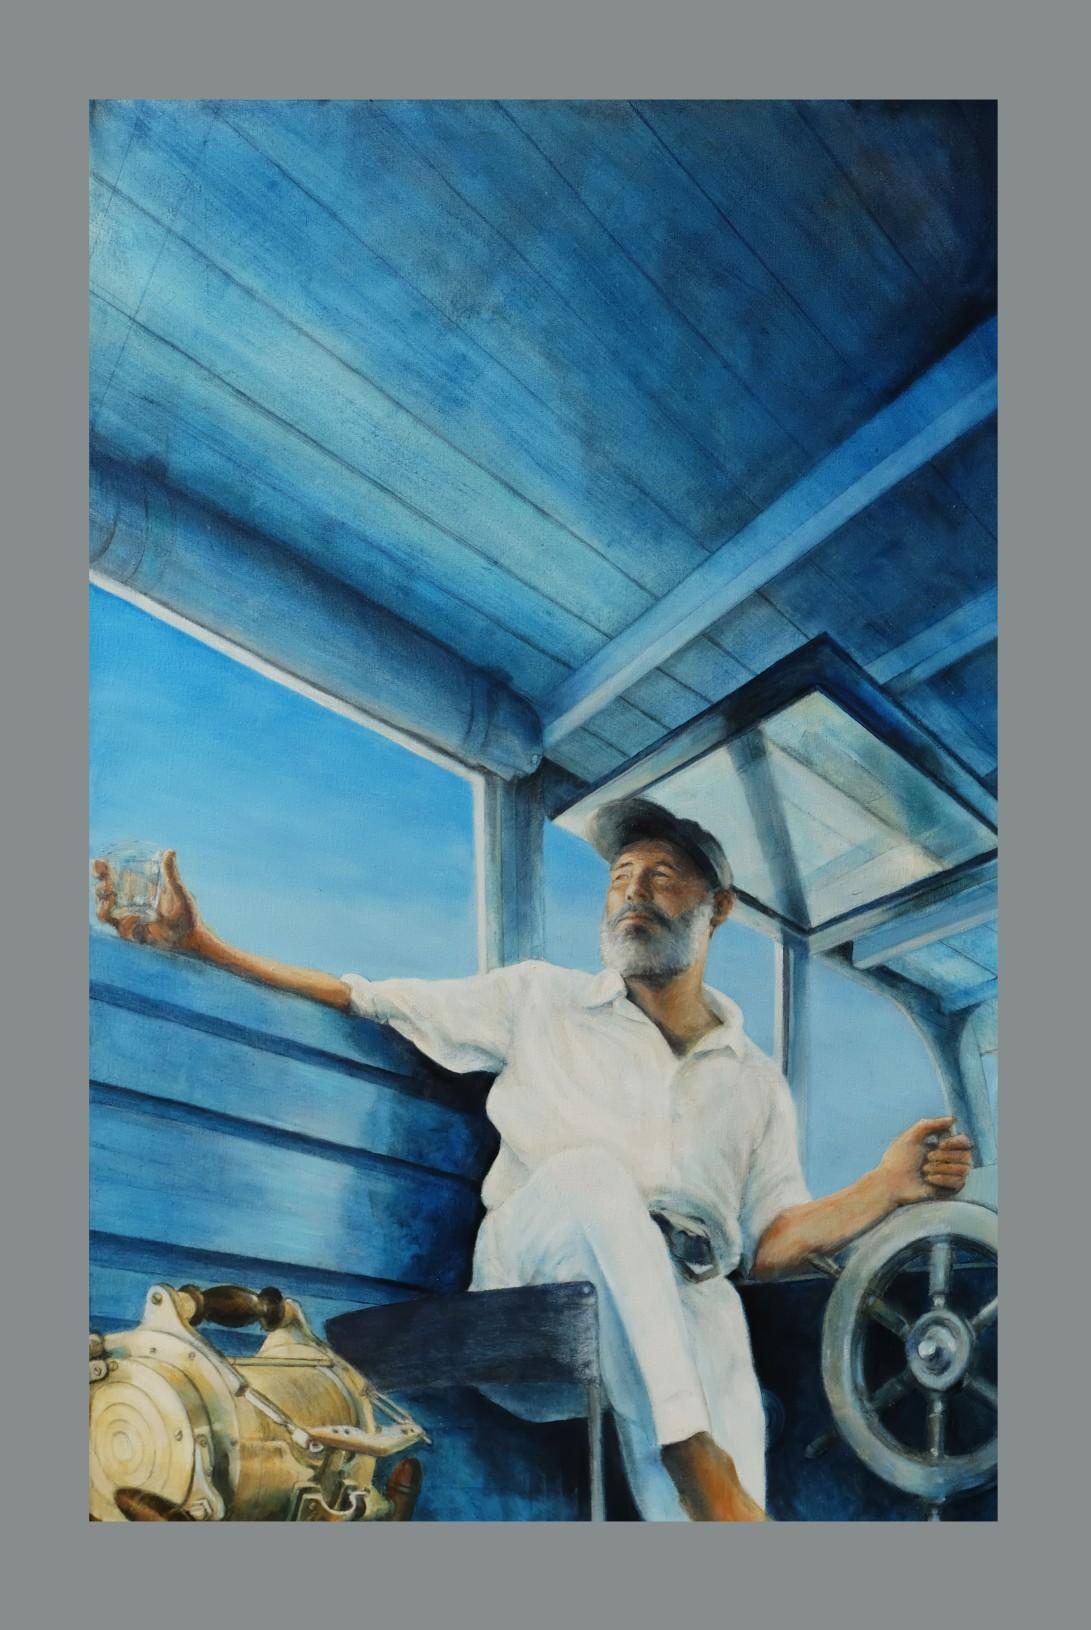 Ernest Hemingway Pilar Gulf stream Sun over the yard arm 1947 sm 060517